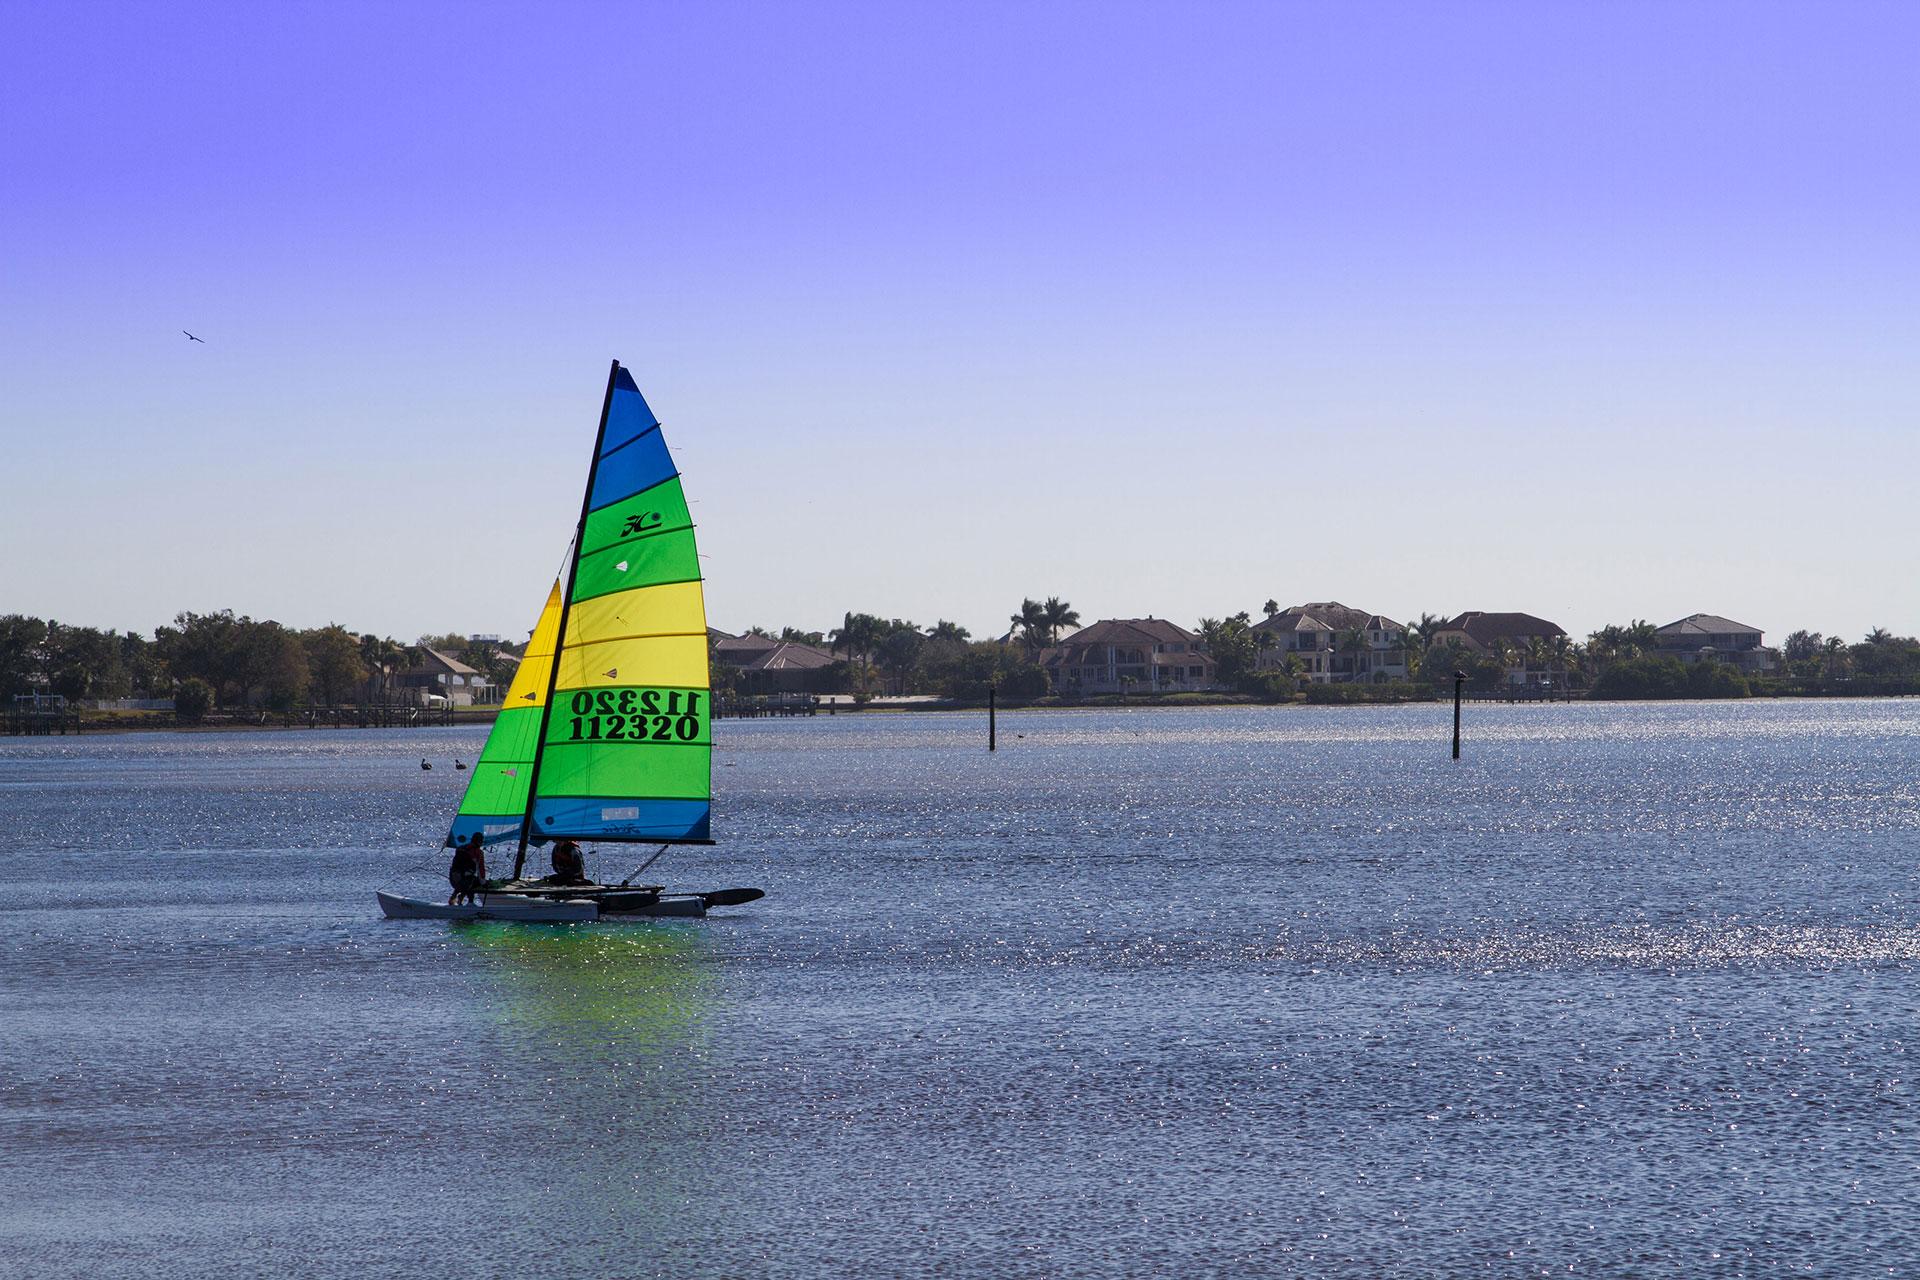 Charlotte Harbor in Punta Gorda, Florida; Courtesy of Punta Gorda / Englewood Beach Visitor & Convention Bureau